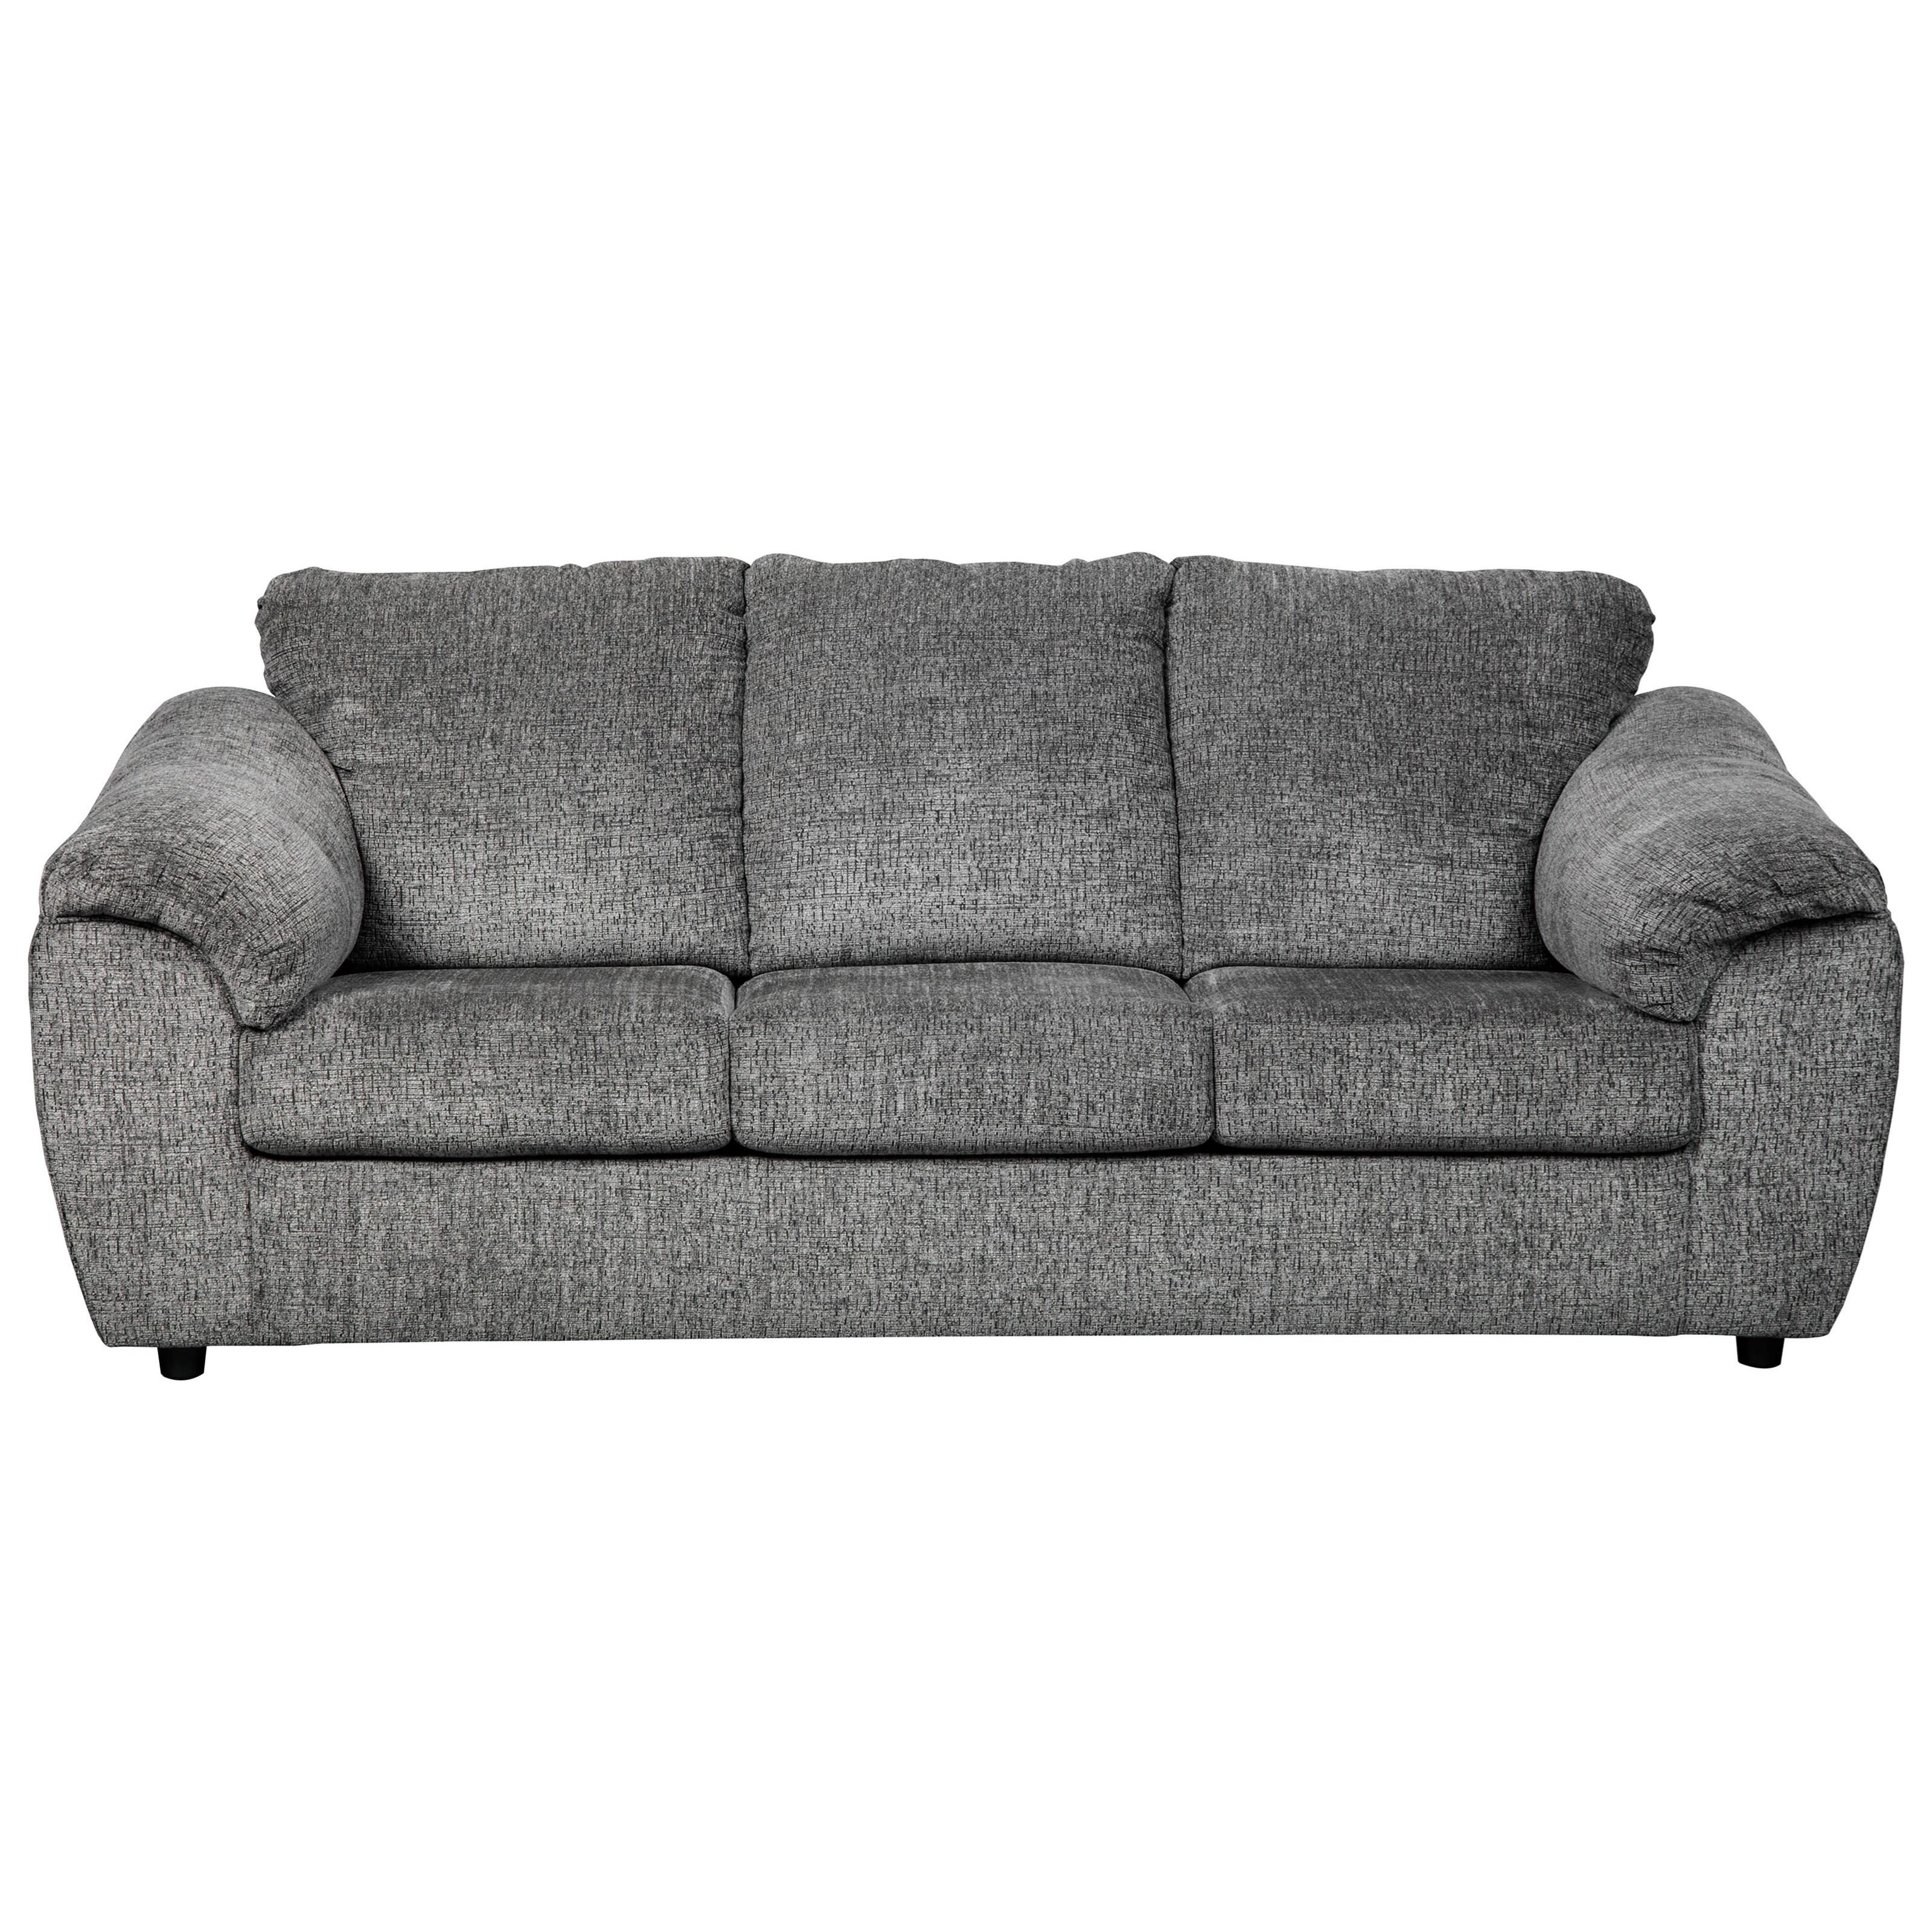 Signature Design By Ashley Azaline Full Sofa Sleeper With Memory Foam  Mattress